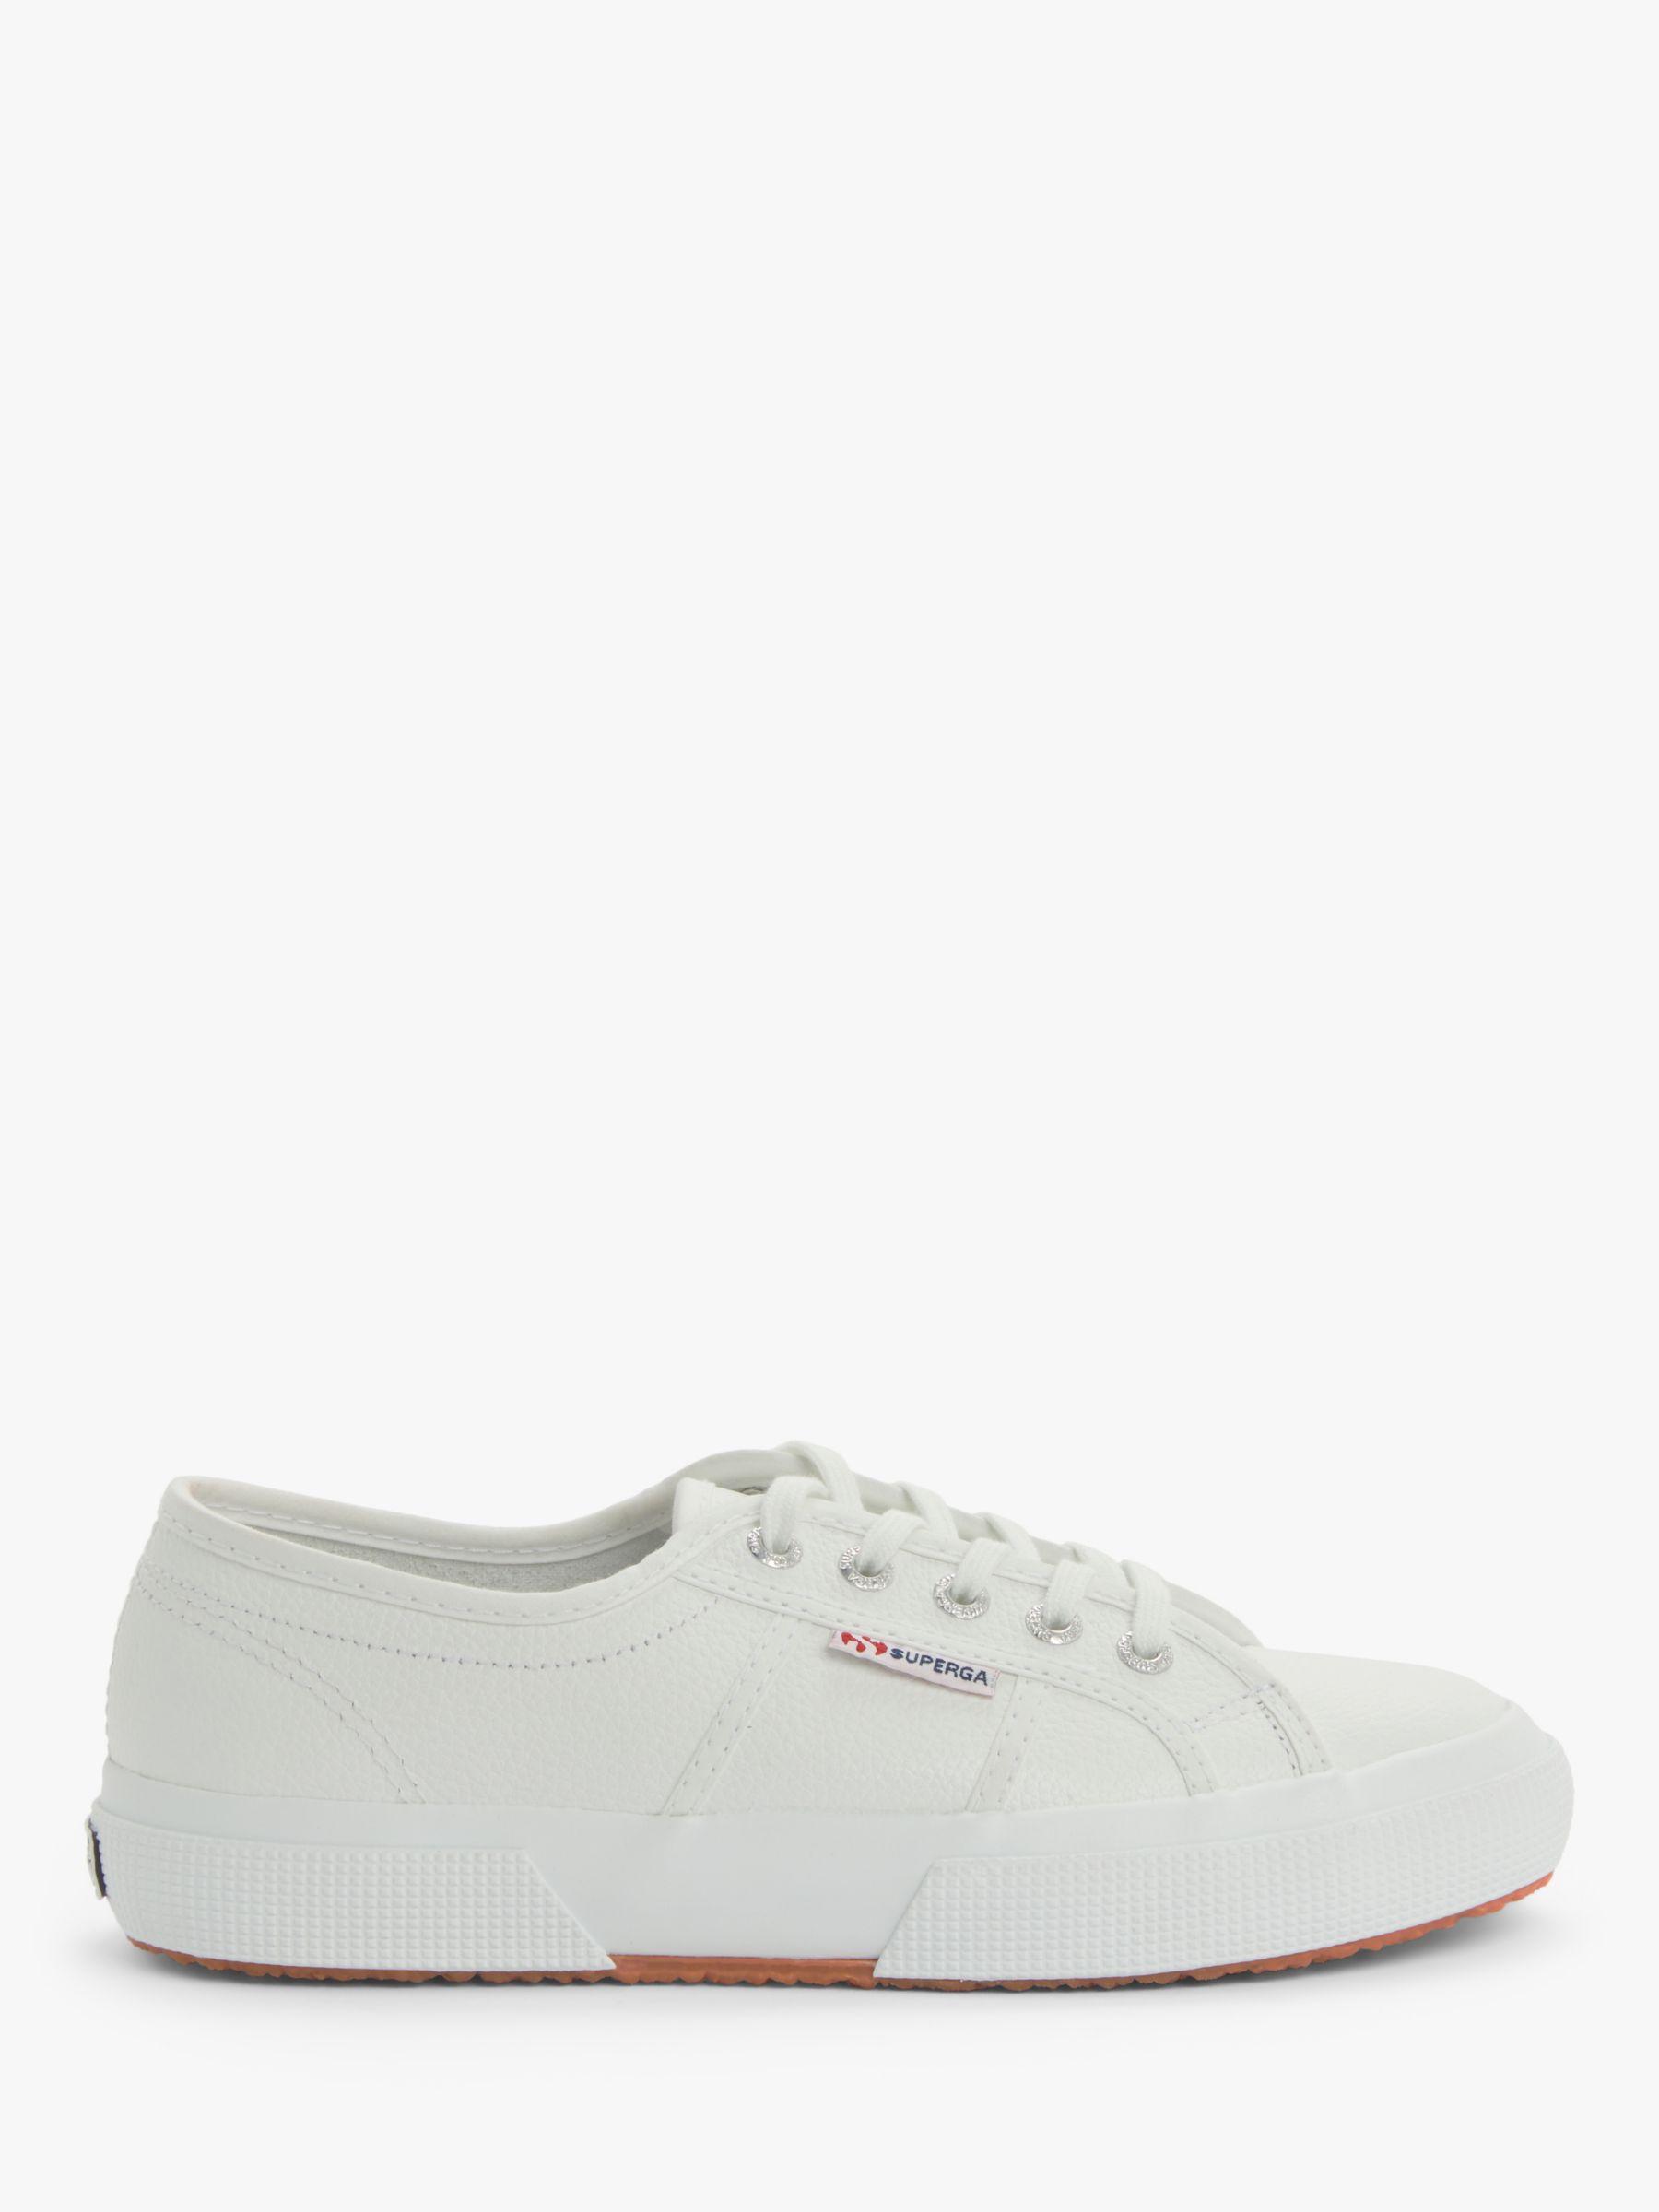 Superga Superga 2750 Efglu Plimsolls, White Leather